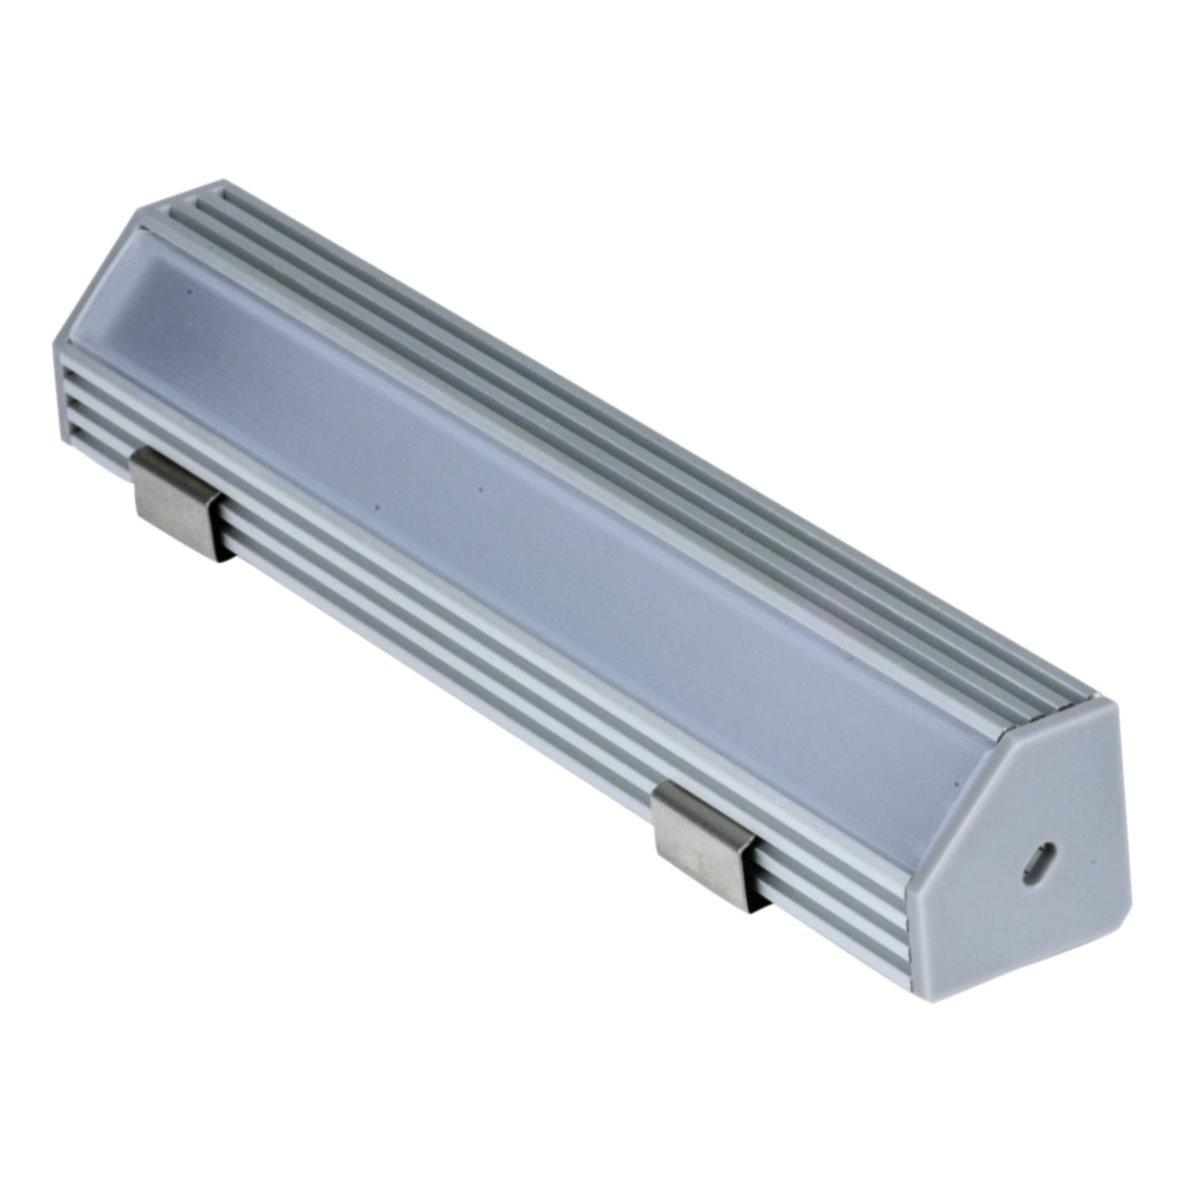 19 9 m led aluprofil alu profil schiene aluminium strip streifen lichtband ebay. Black Bedroom Furniture Sets. Home Design Ideas